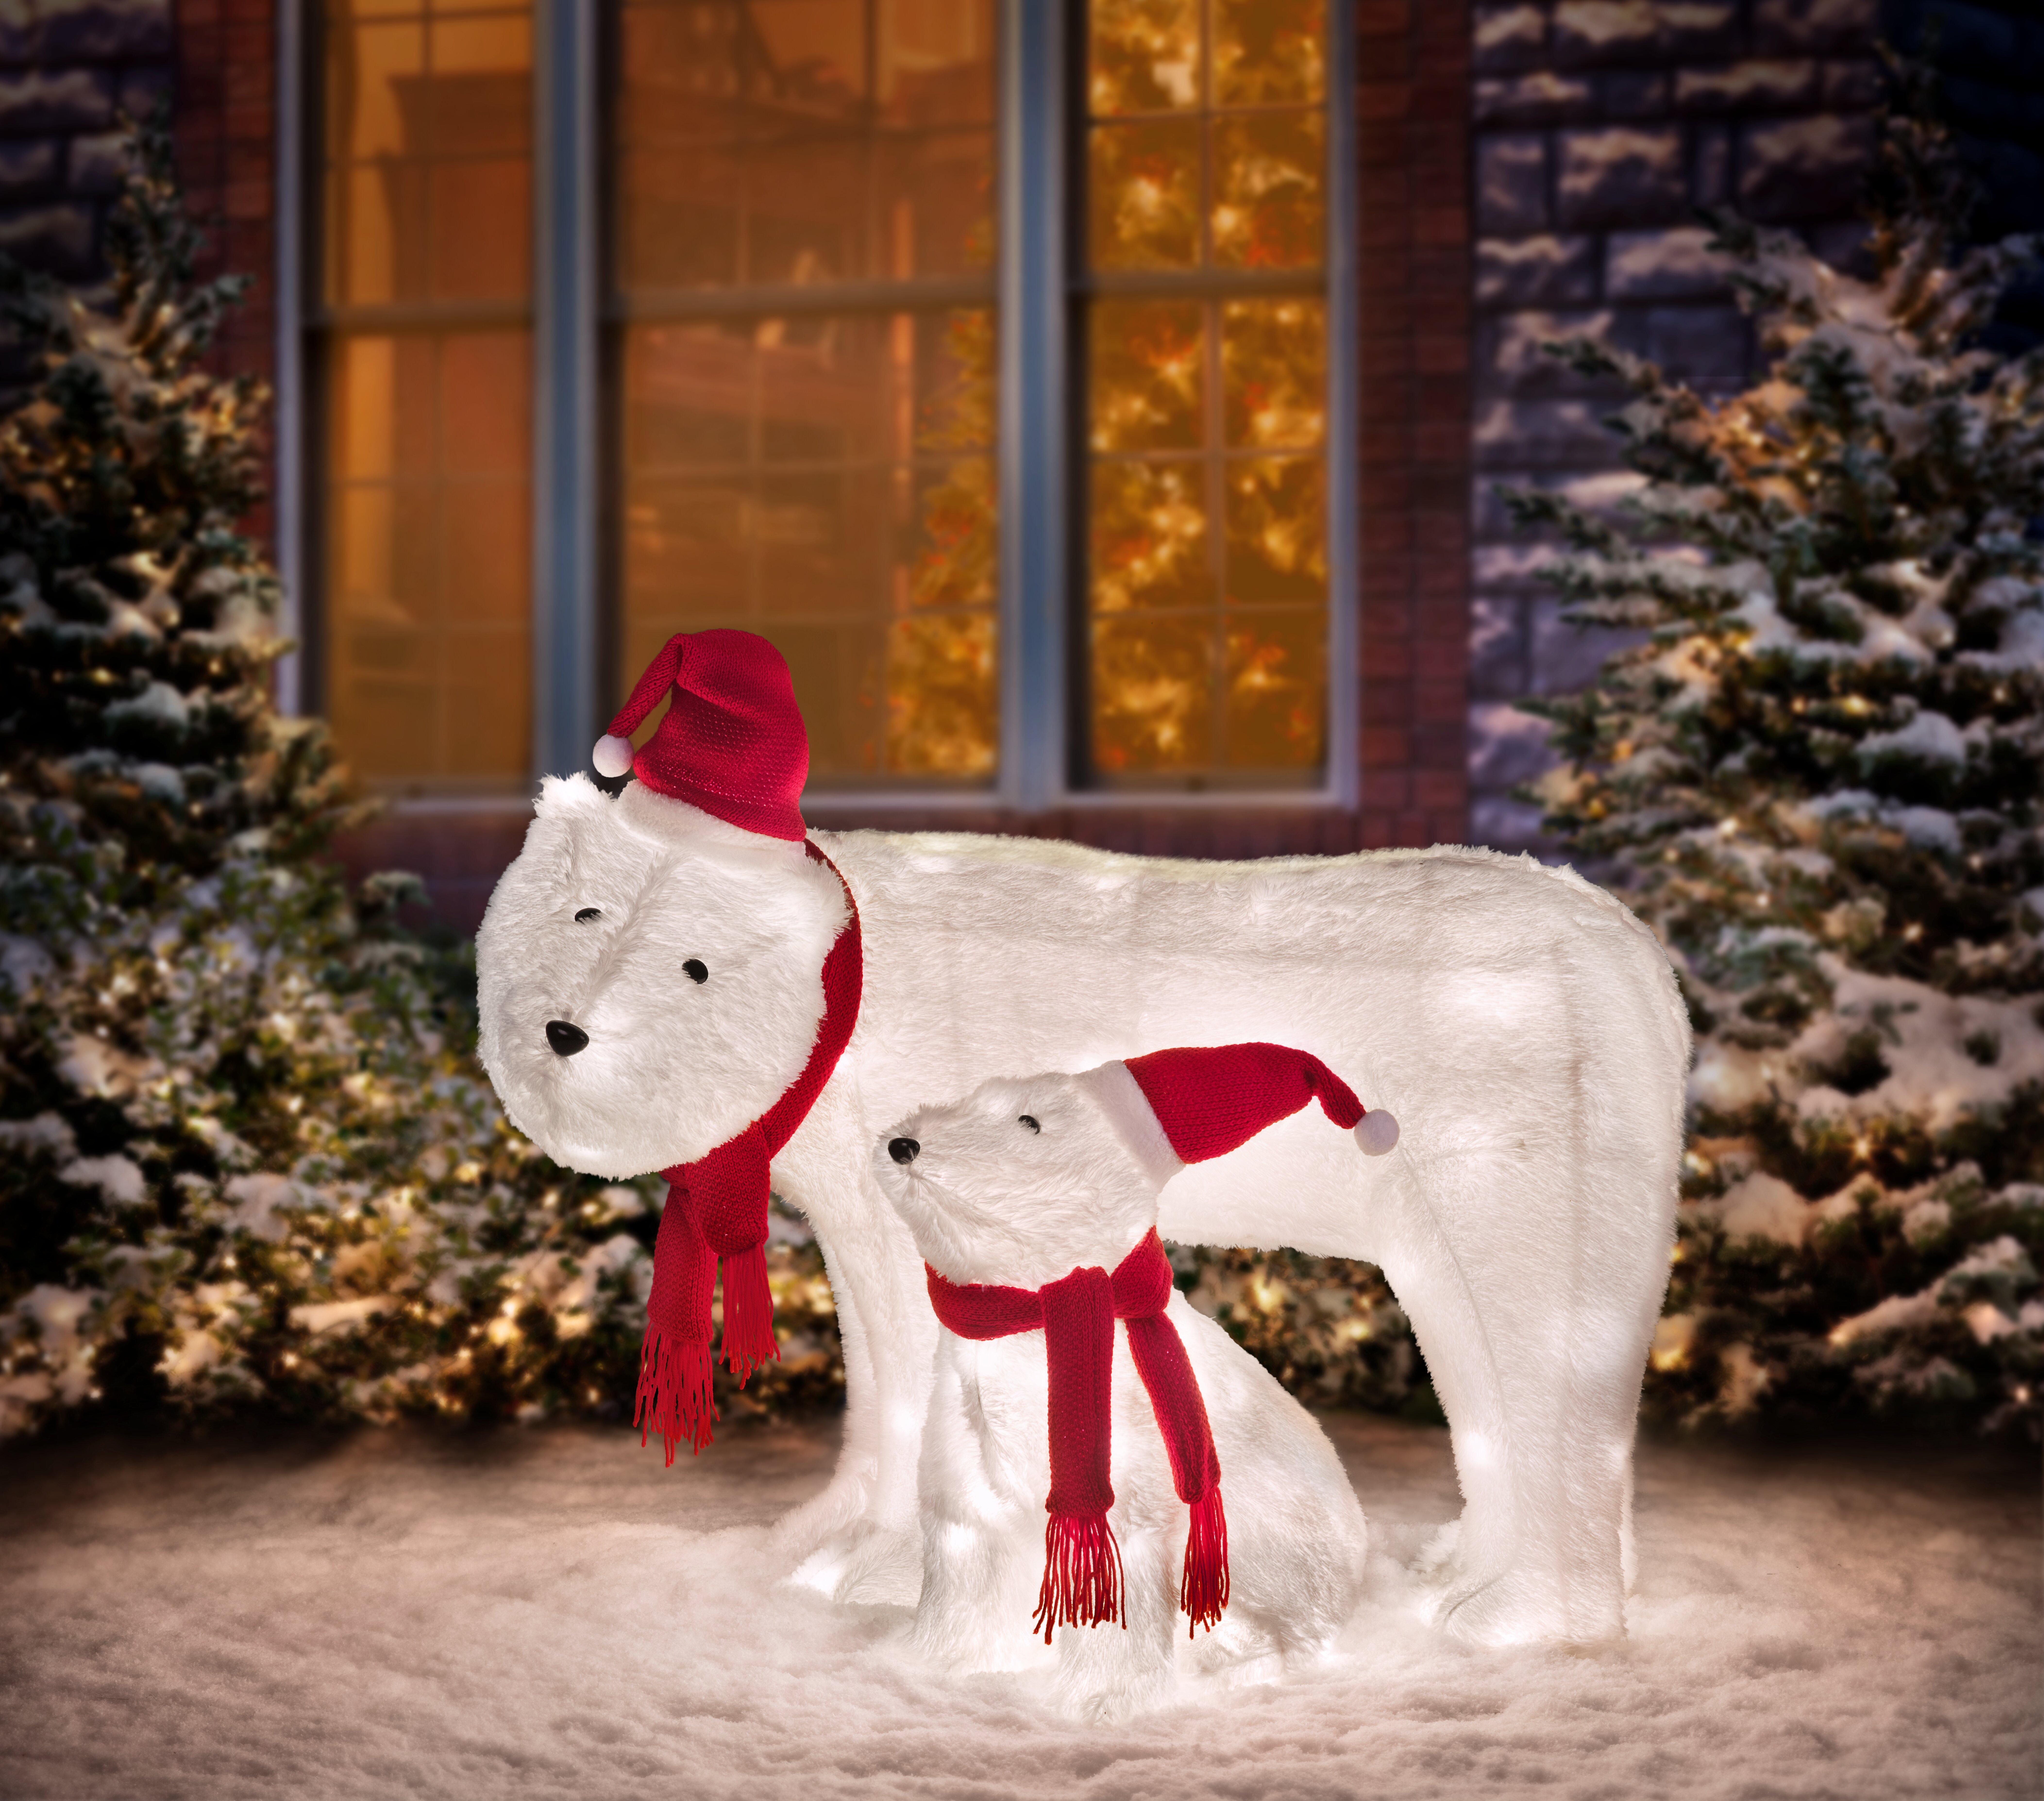 2 Piece Polar Bear Lighted Display Set